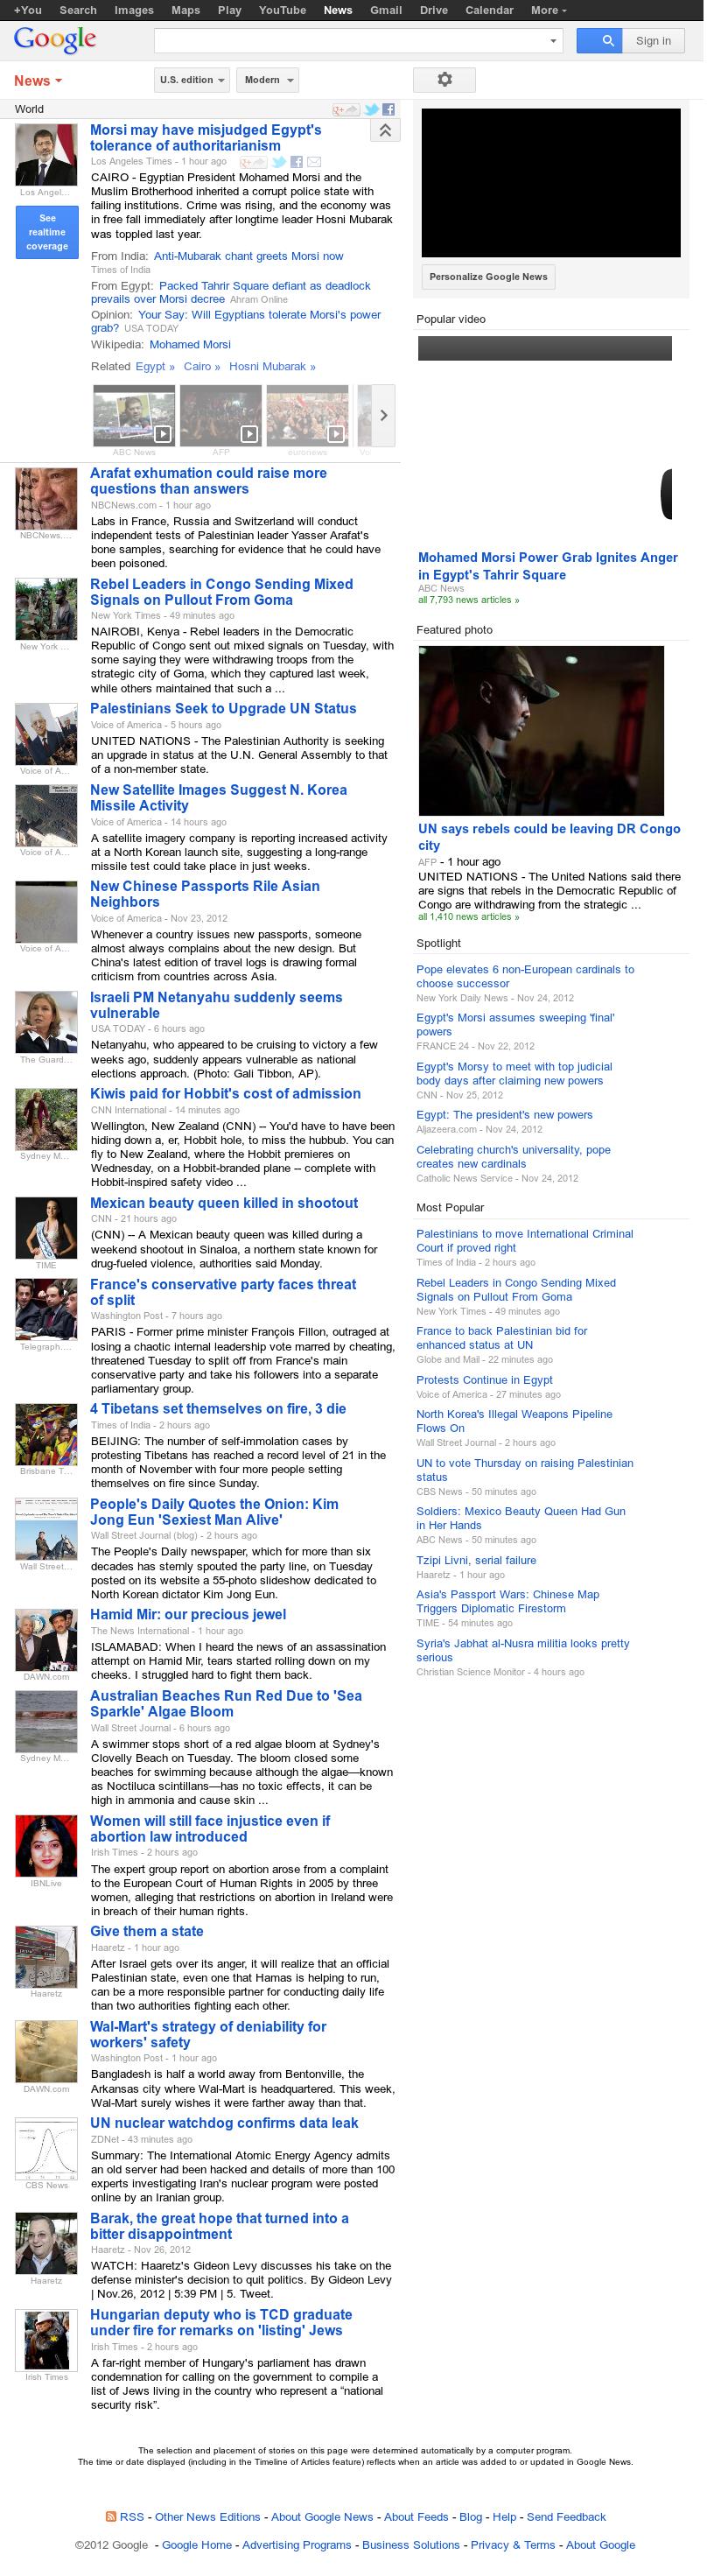 Google News: World at Wednesday Nov. 28, 2012, 3:16 a.m. UTC